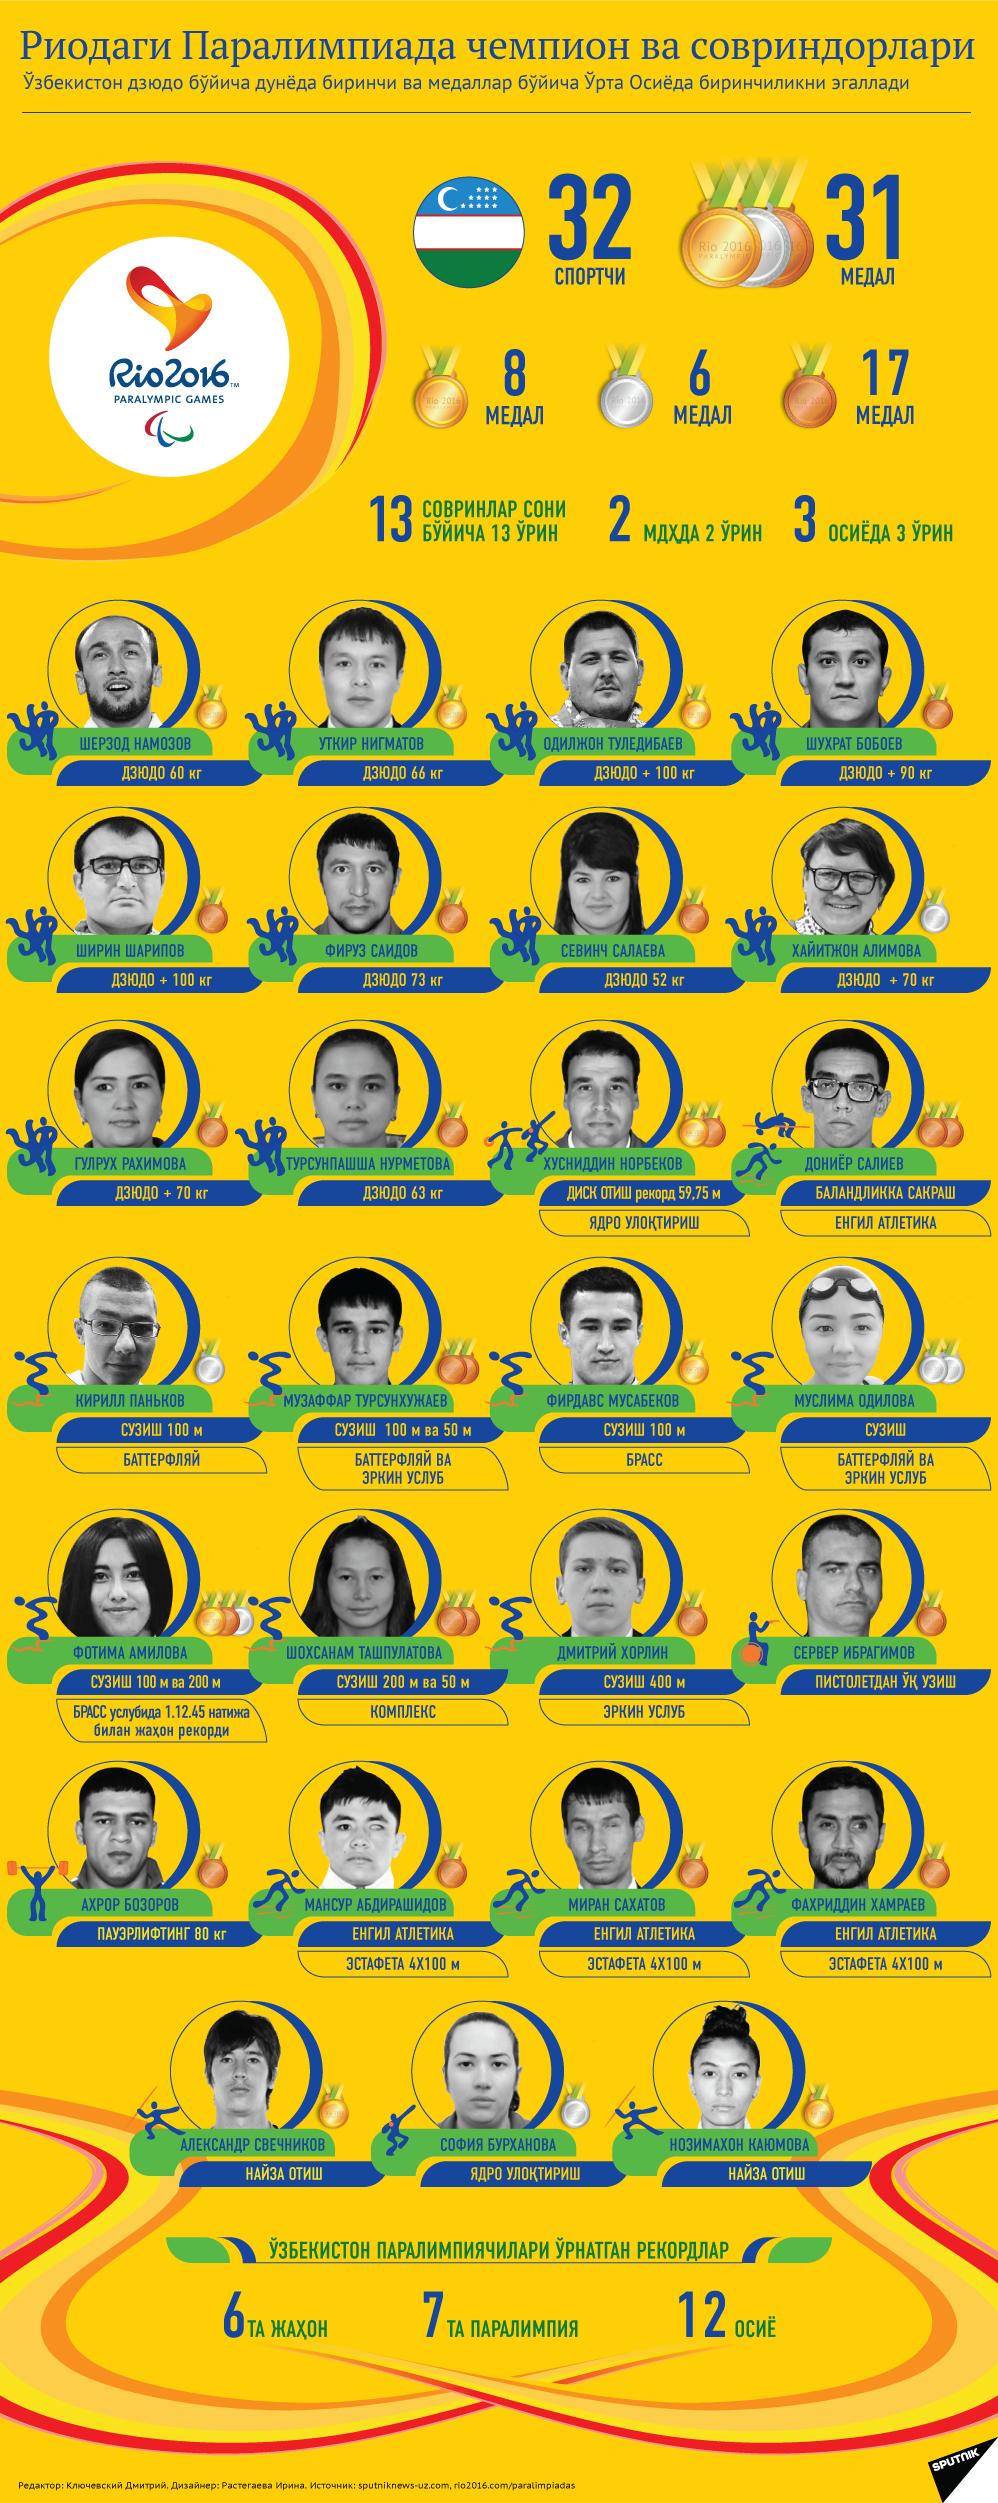 Rioda Paralimpiada oʻyinlari - Sputnik Oʻzbekiston